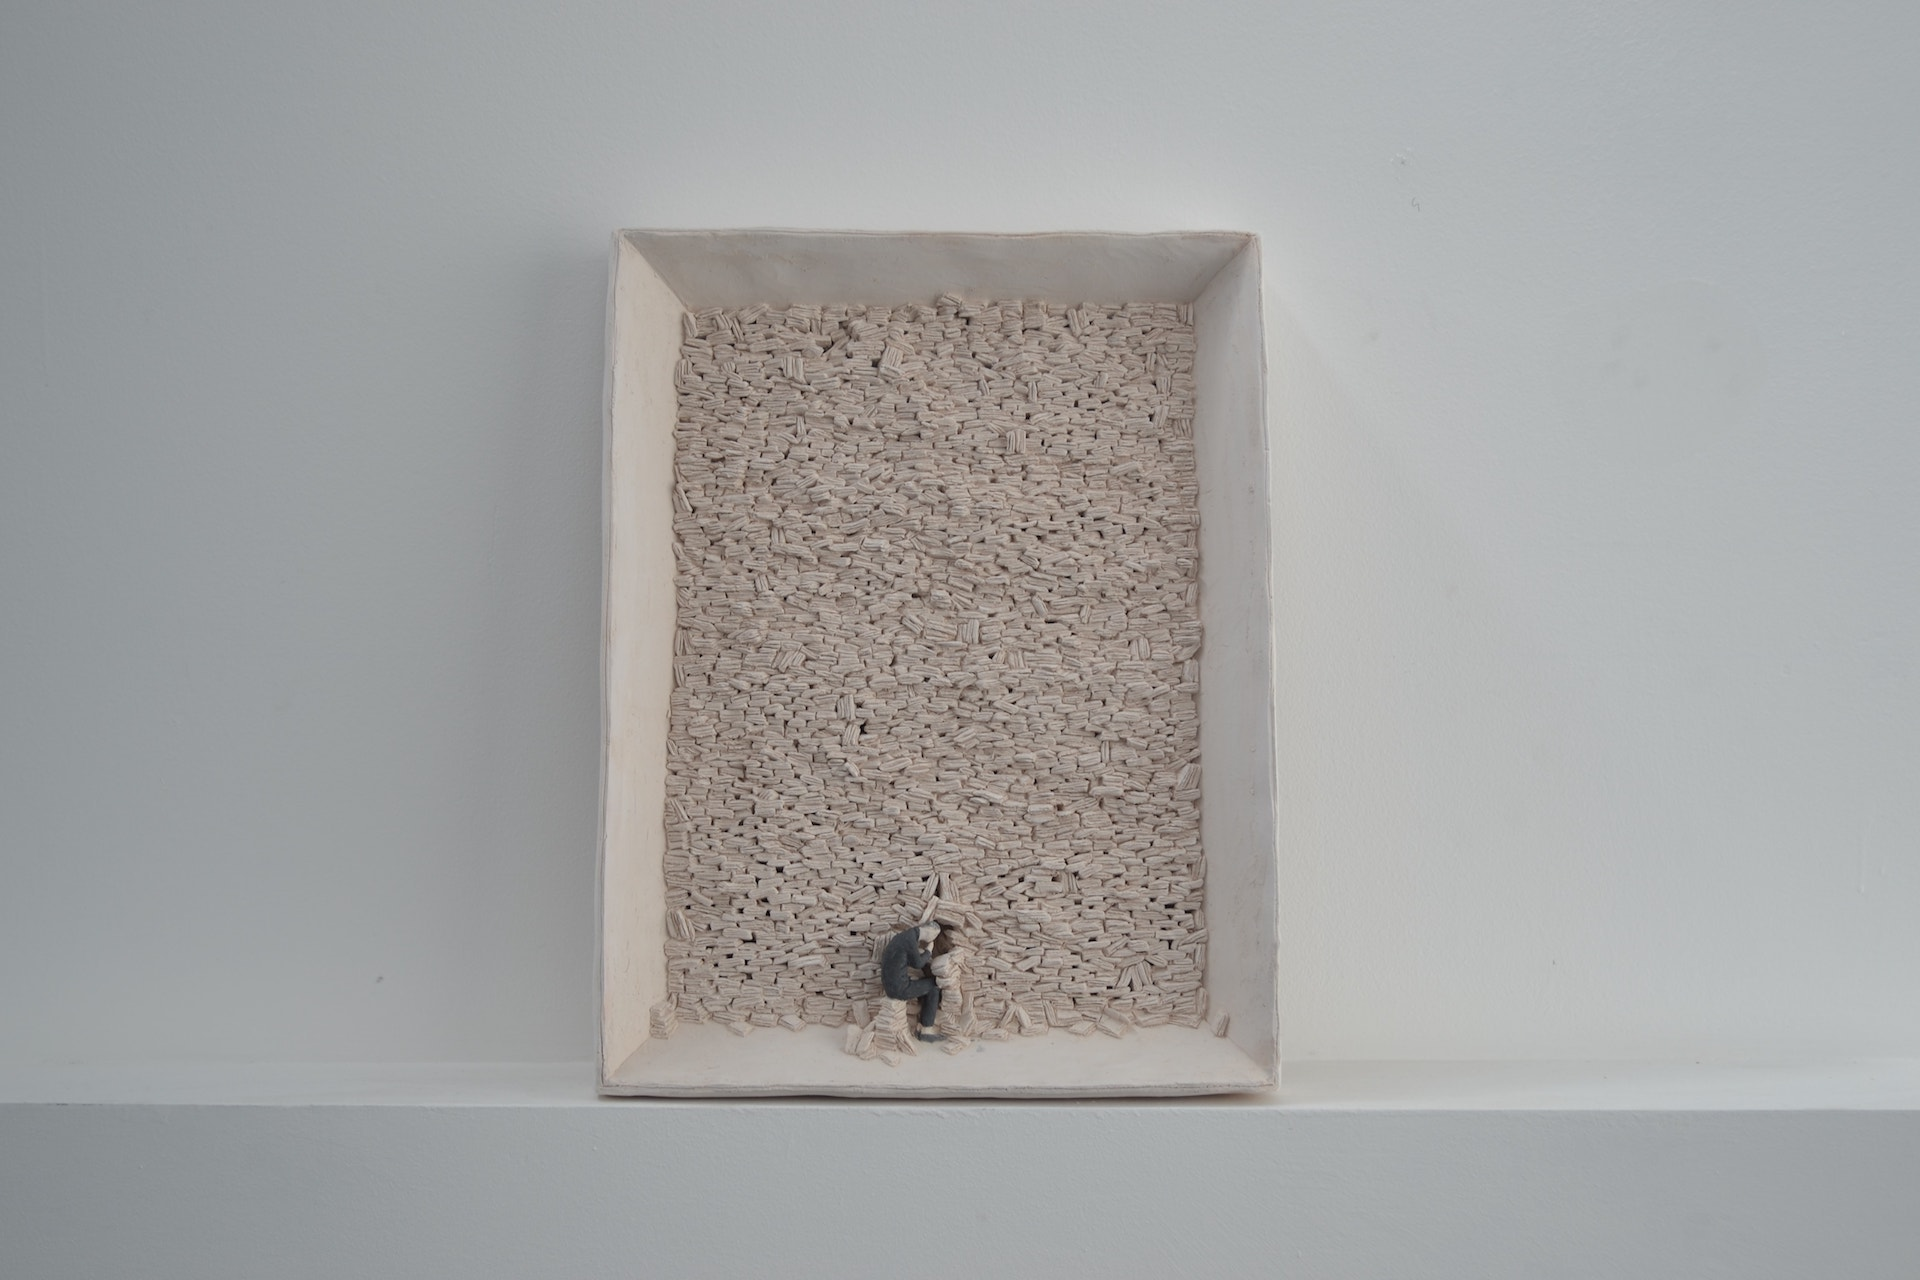 San Tommaso, 2018, terracotta a ingobbio, 39 x 52 x 6 cm